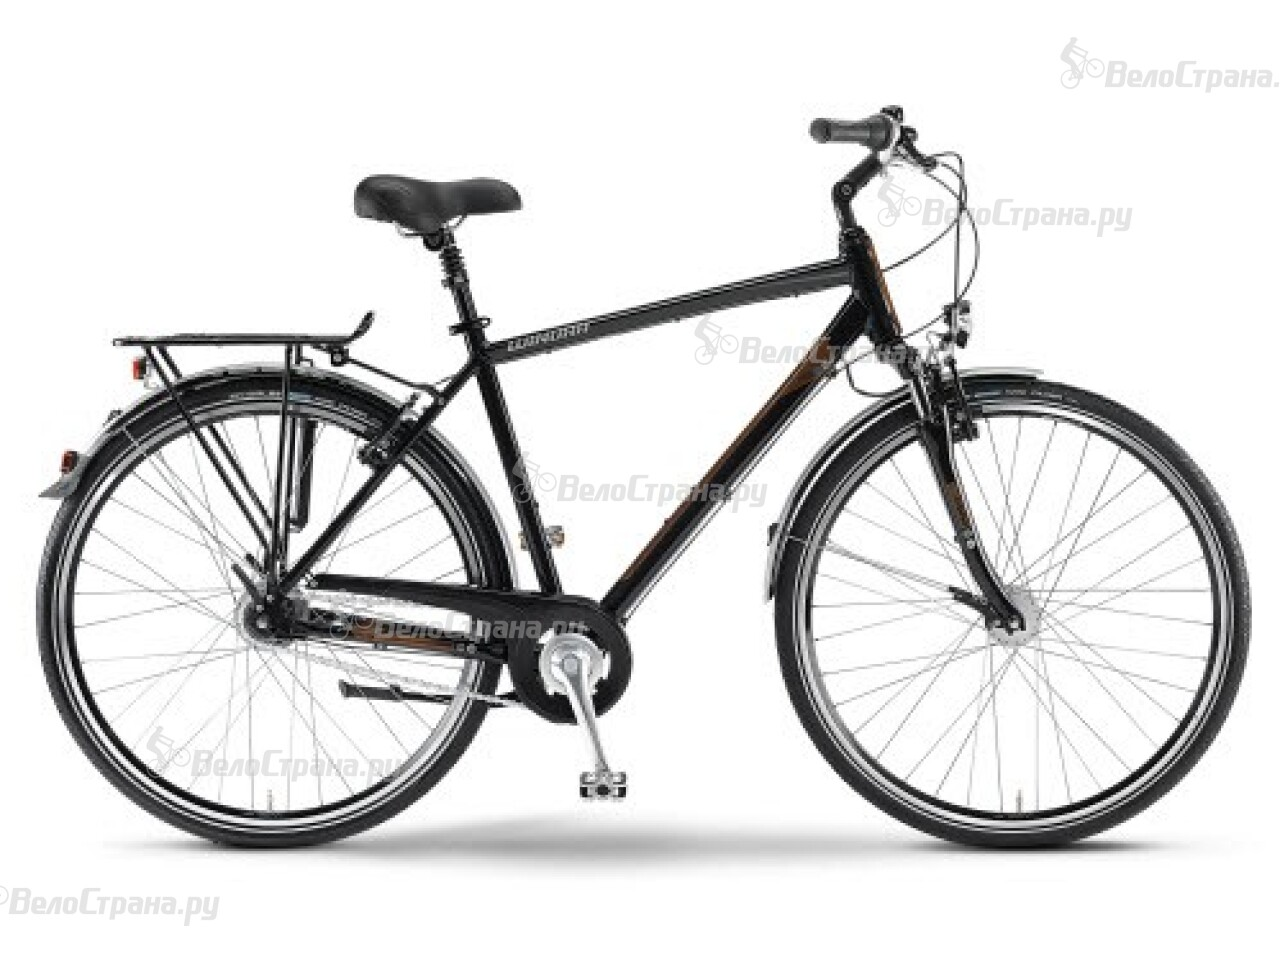 Велосипед Winora Samana gent (2014) велосипед winora jamaica 4 4 2014